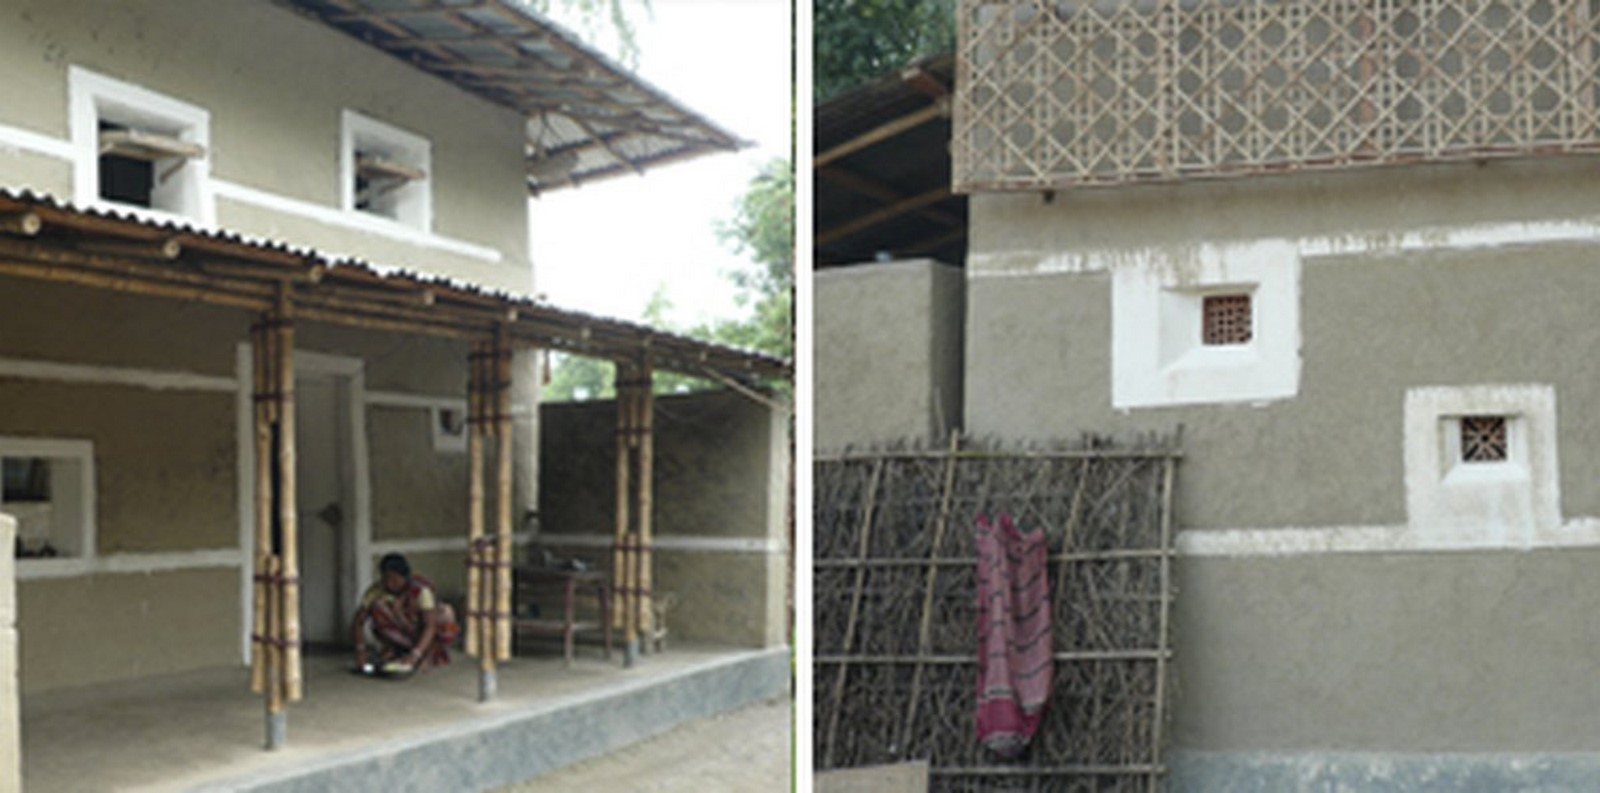 HOMEmade – Family houses in Bangladesh - Sheet1